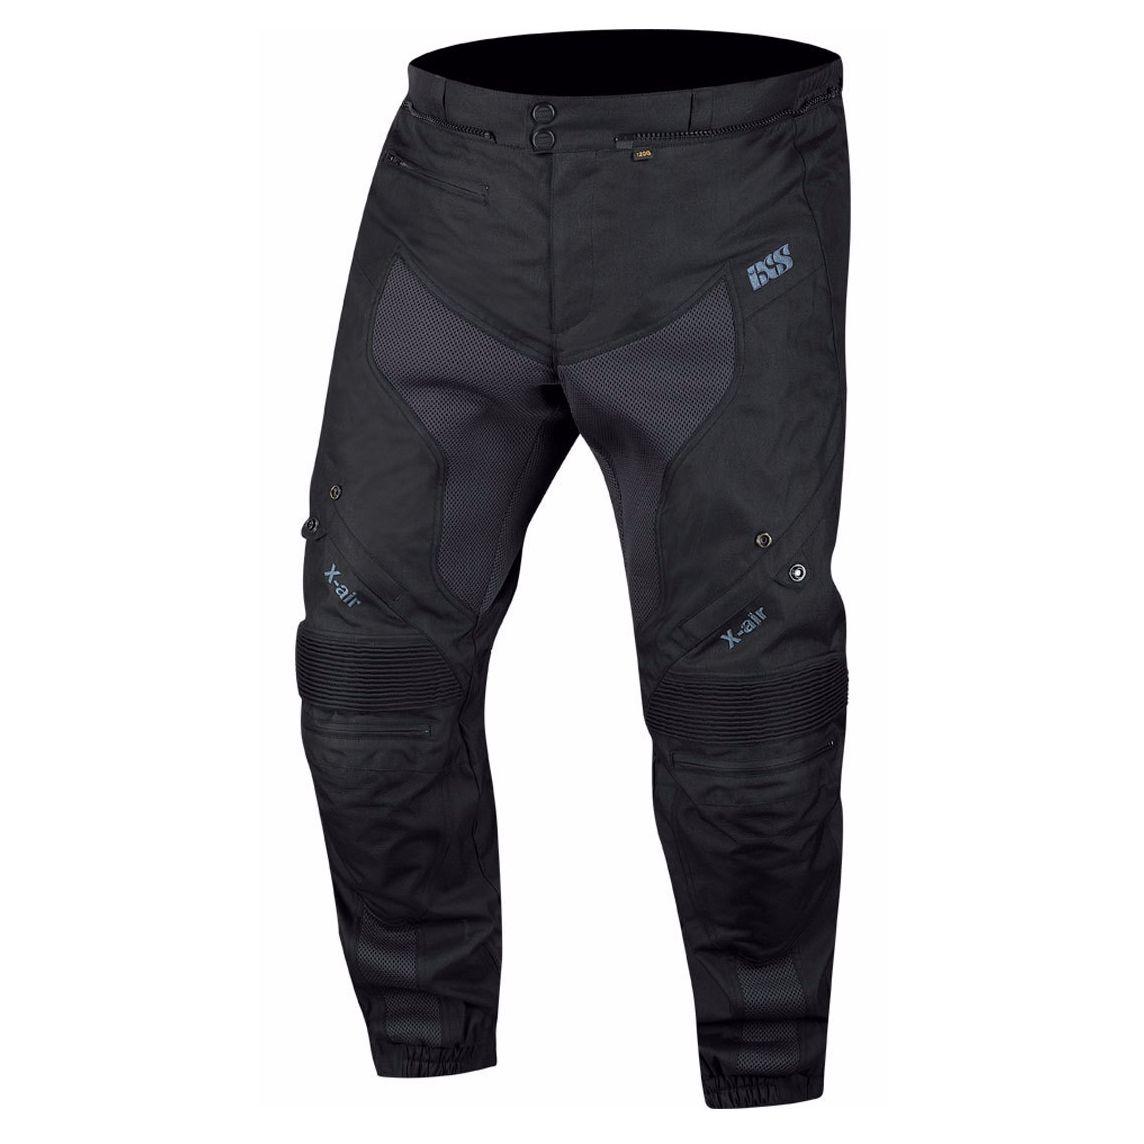 pantalon ixs negev grandes tailles pantalon et combinaison. Black Bedroom Furniture Sets. Home Design Ideas